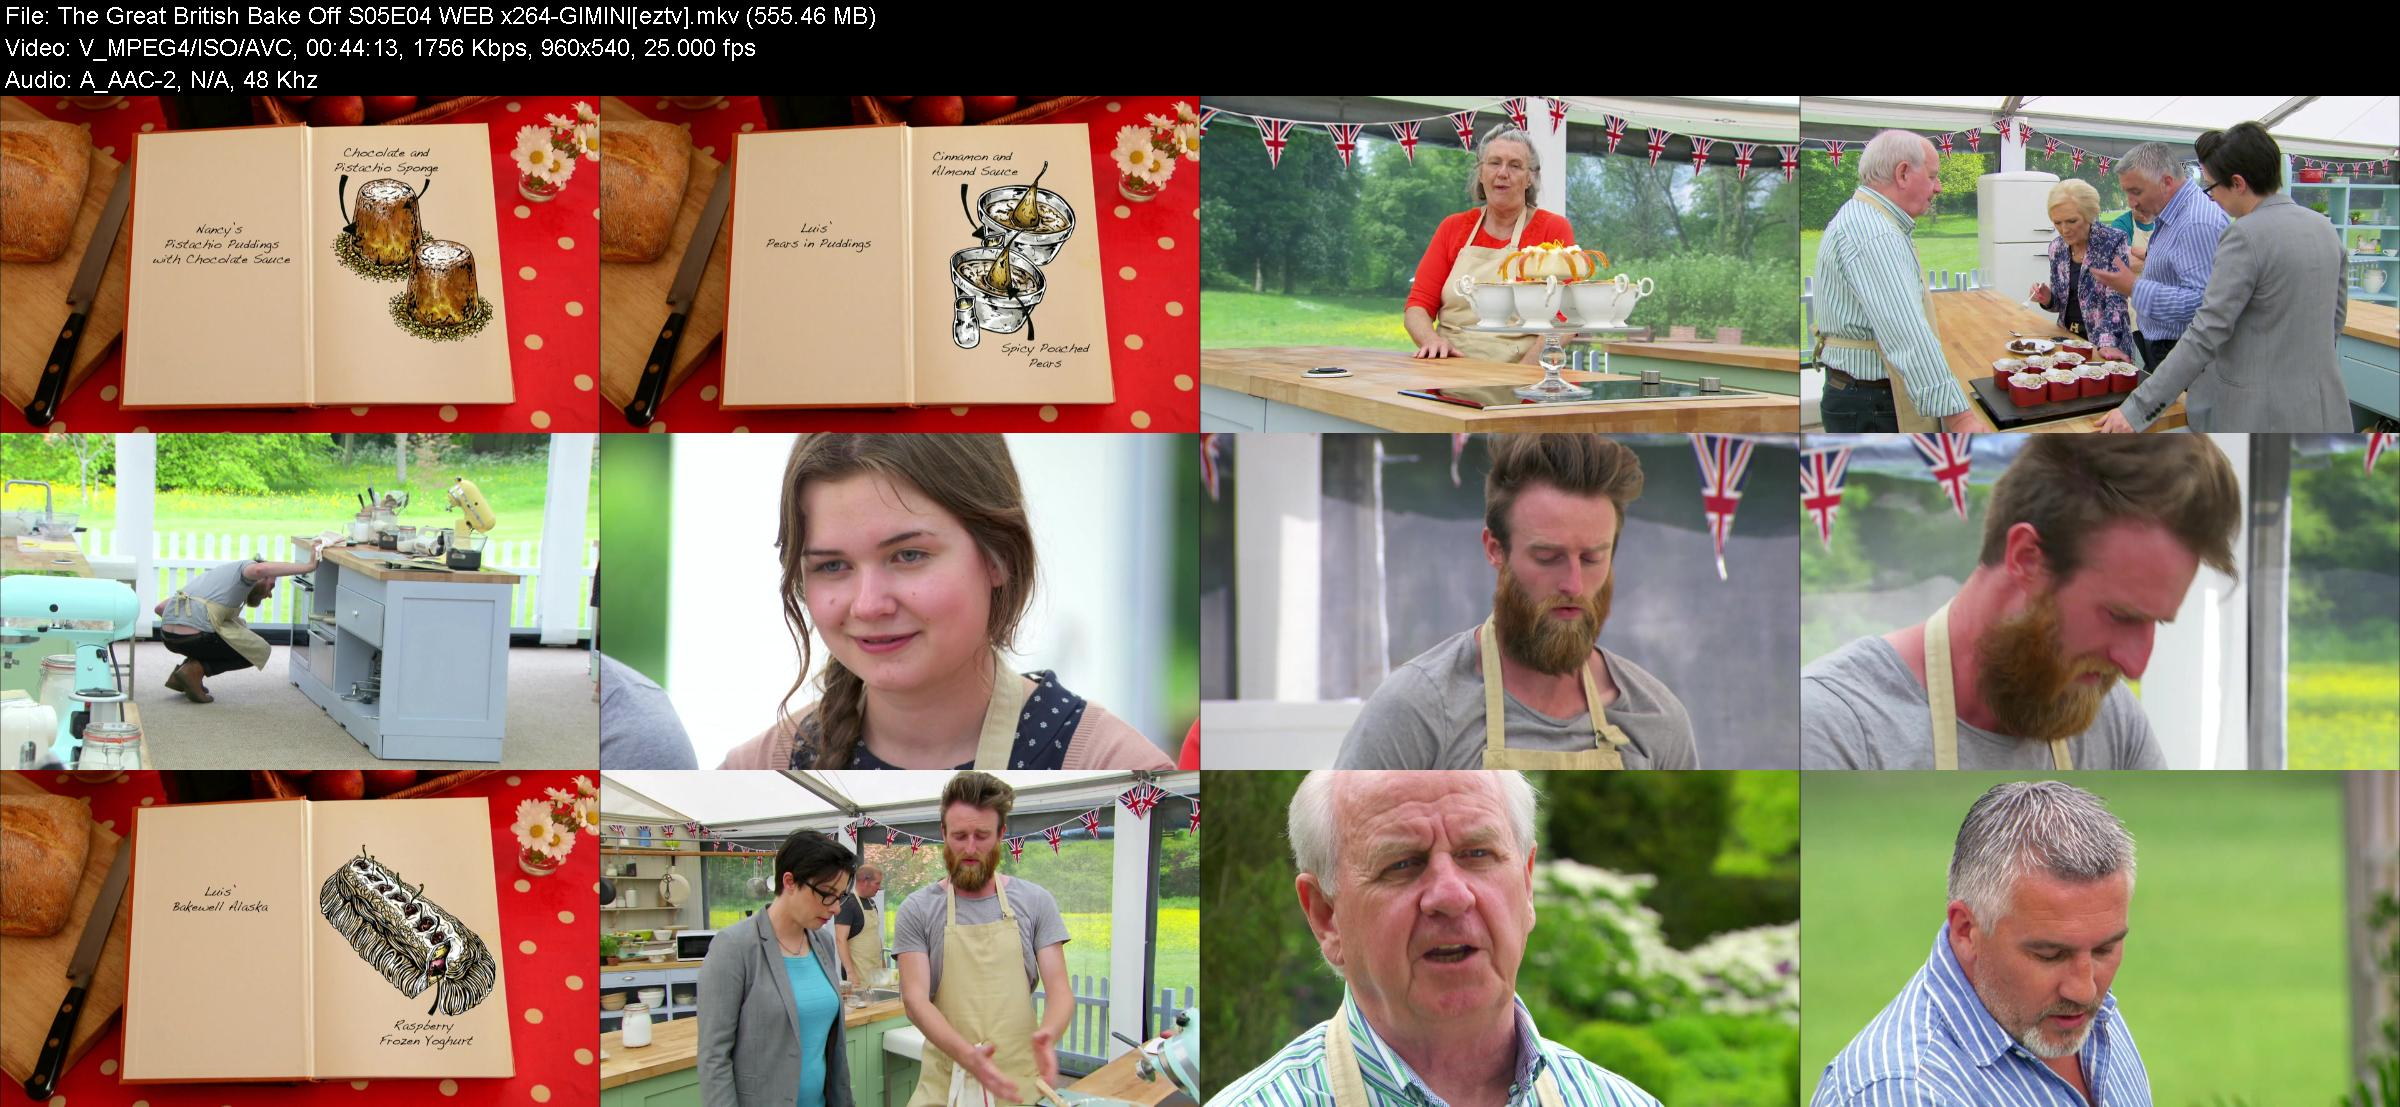 The Great British Bake Off S05E04 WEB x264-GIMINI